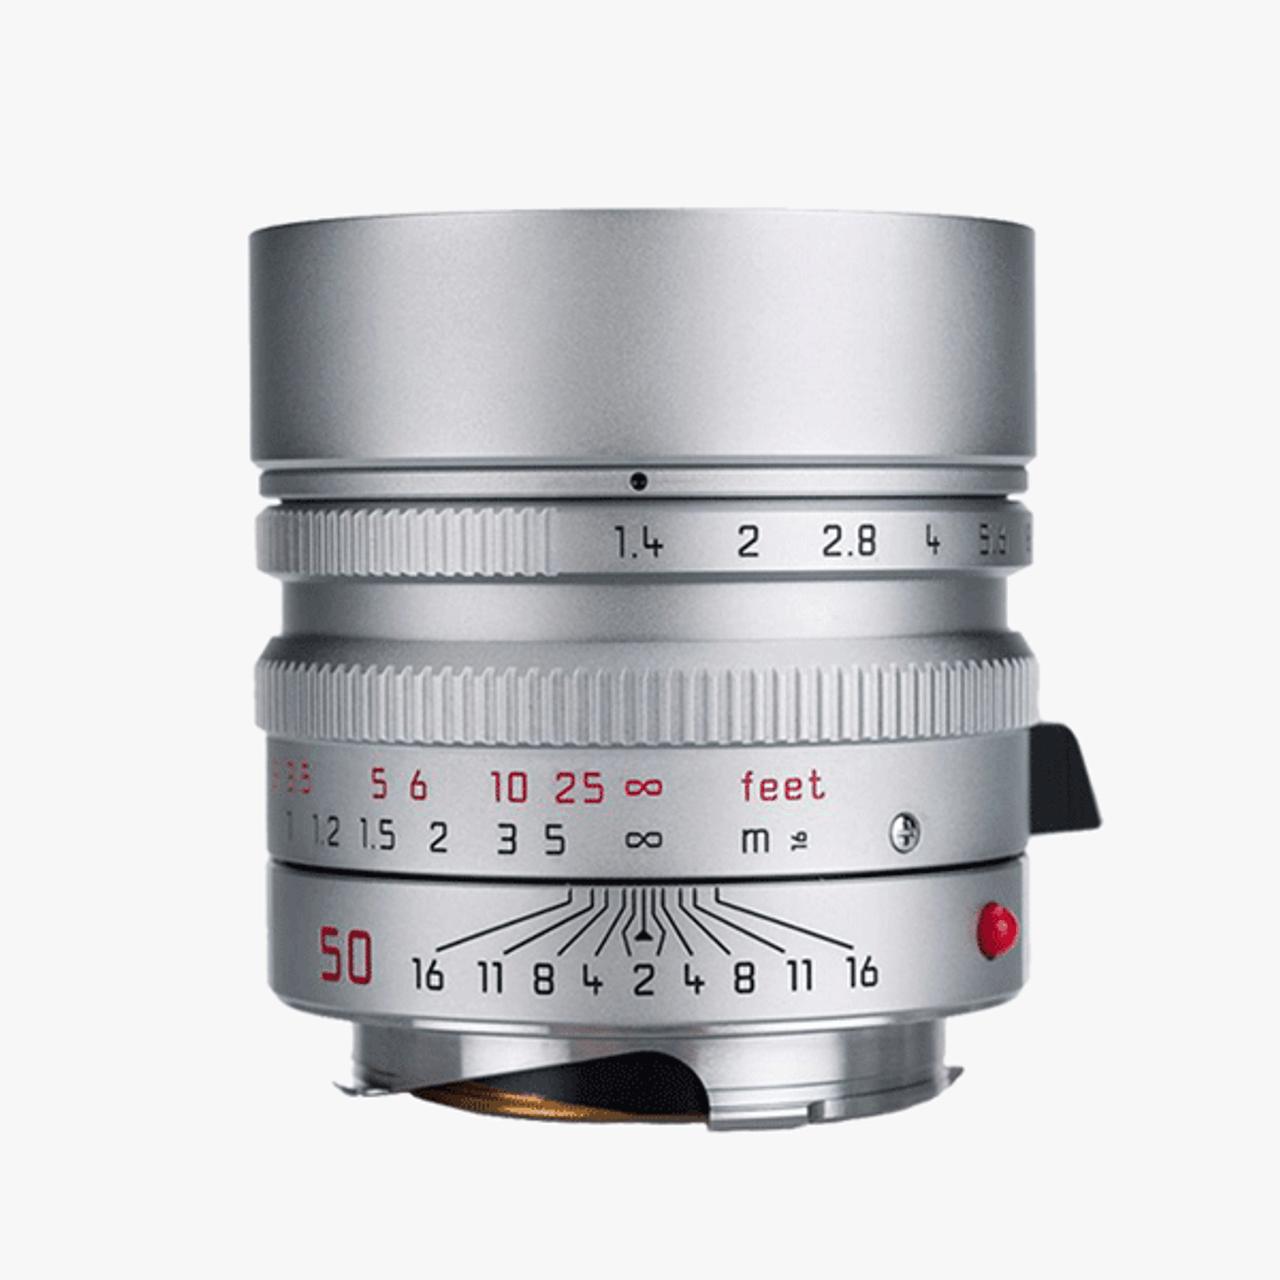 Leica Summilux-M 50mm F1.4 ASPH Silver (11892)